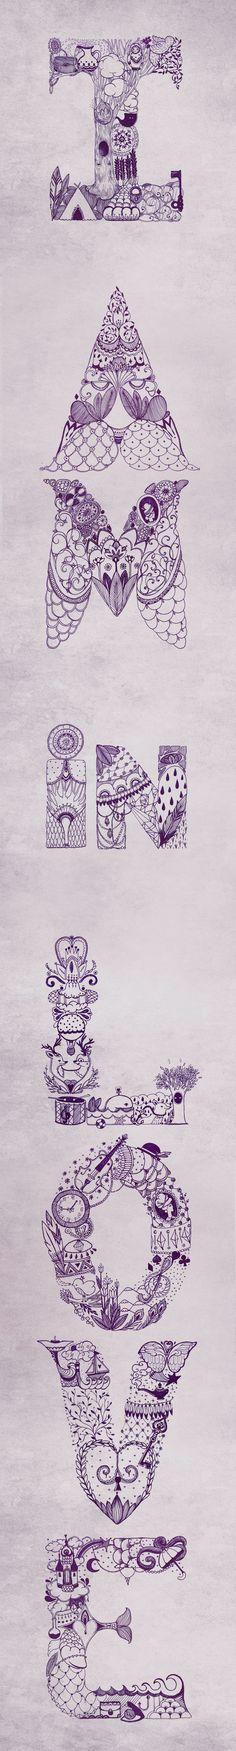 Type illustration by Ei Ka